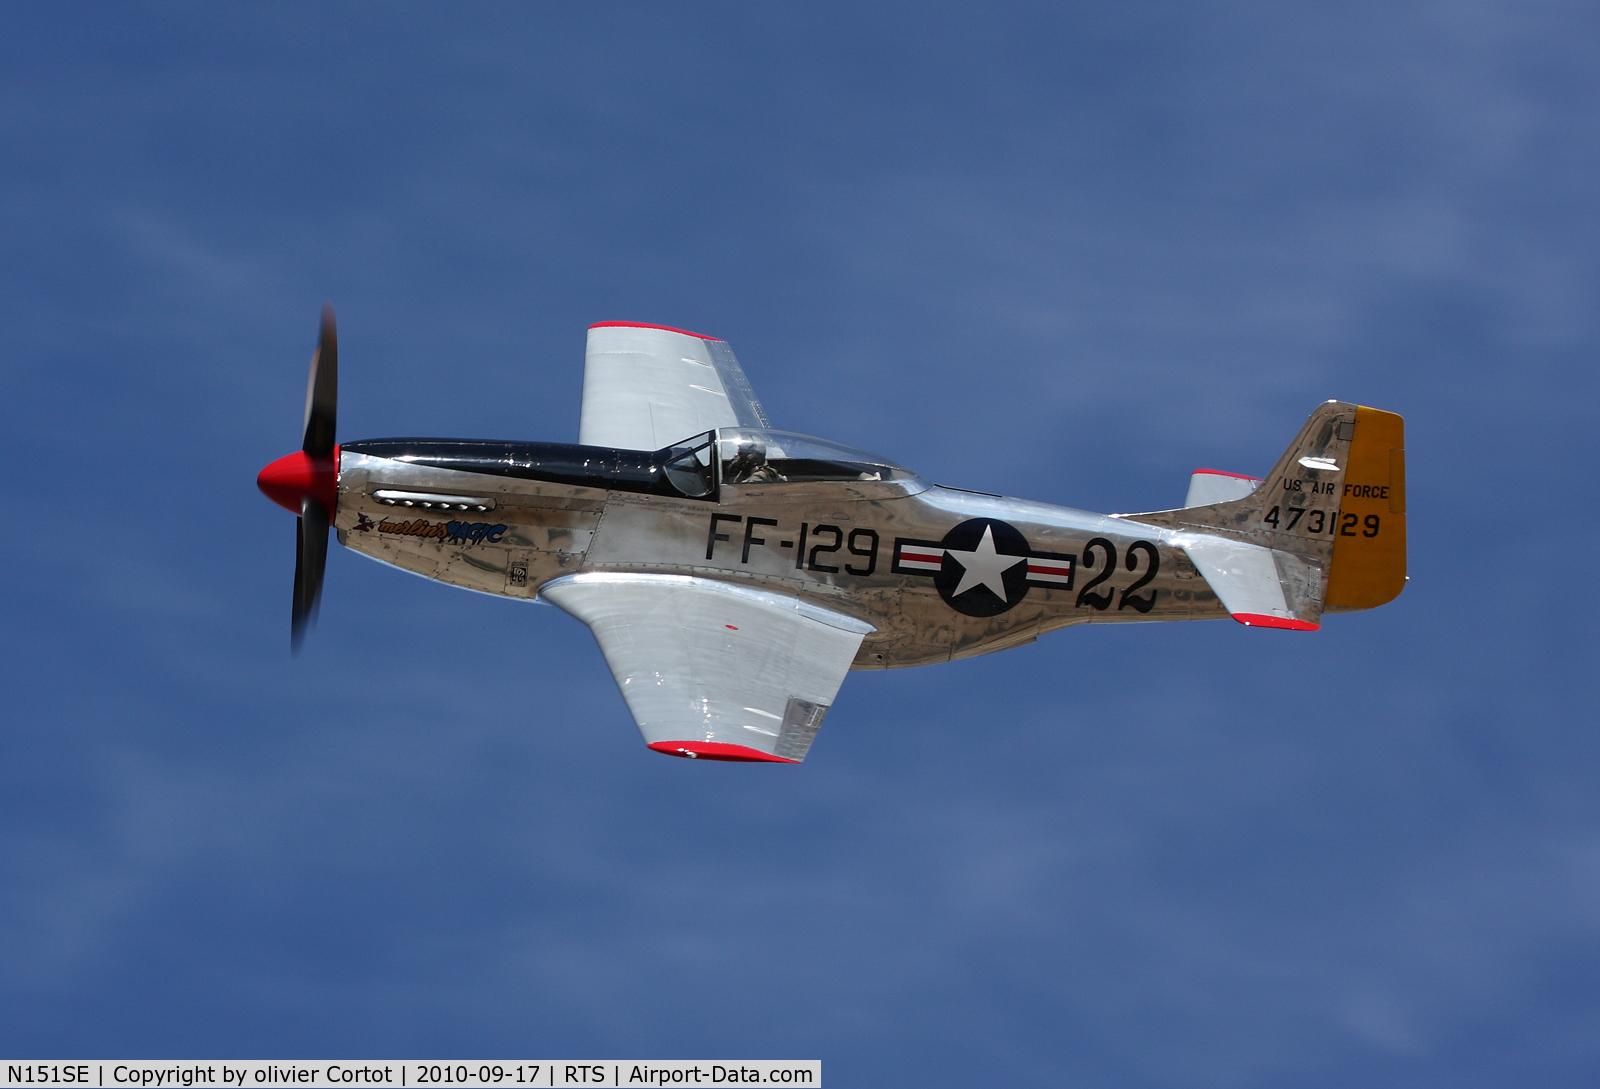 N151SE, 1944 North American P-51D Mustang C/N 122-39588 (44-73129), Profil view of merlin magic during the 2010 Reno air races